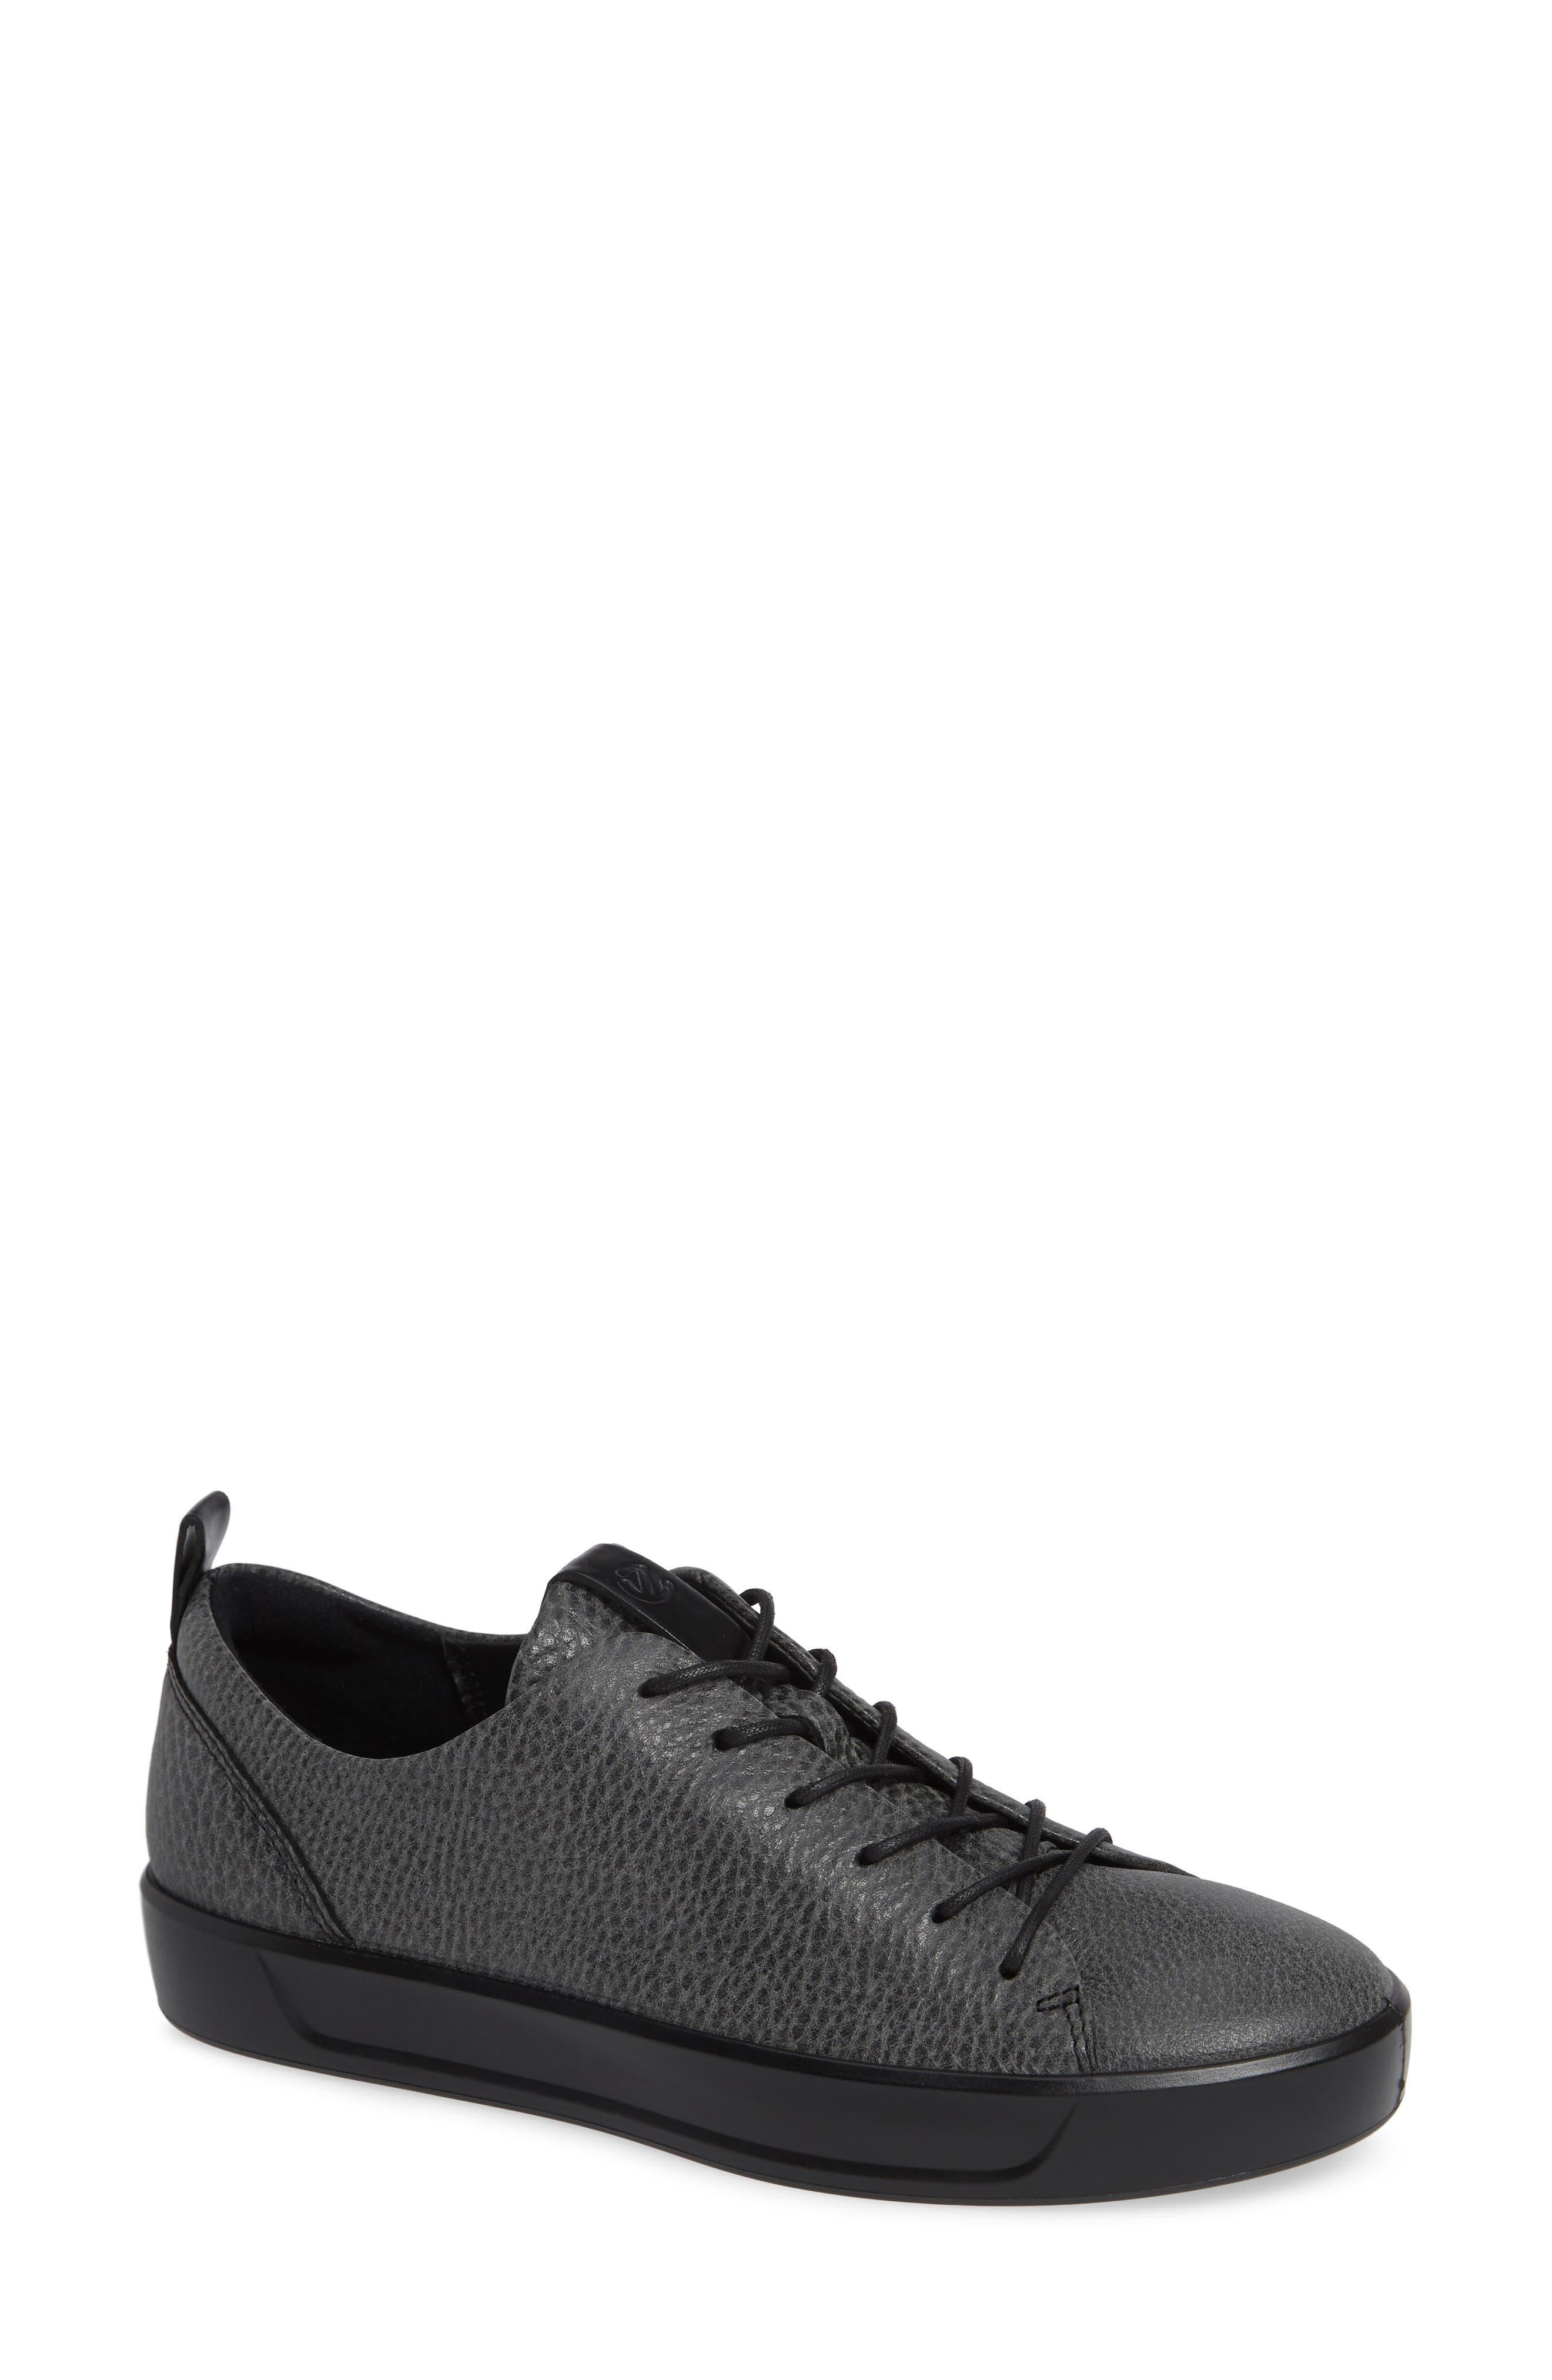 Soft 8 Sneaker,                         Main,                         color, BLACK/ BLACK LEATHER